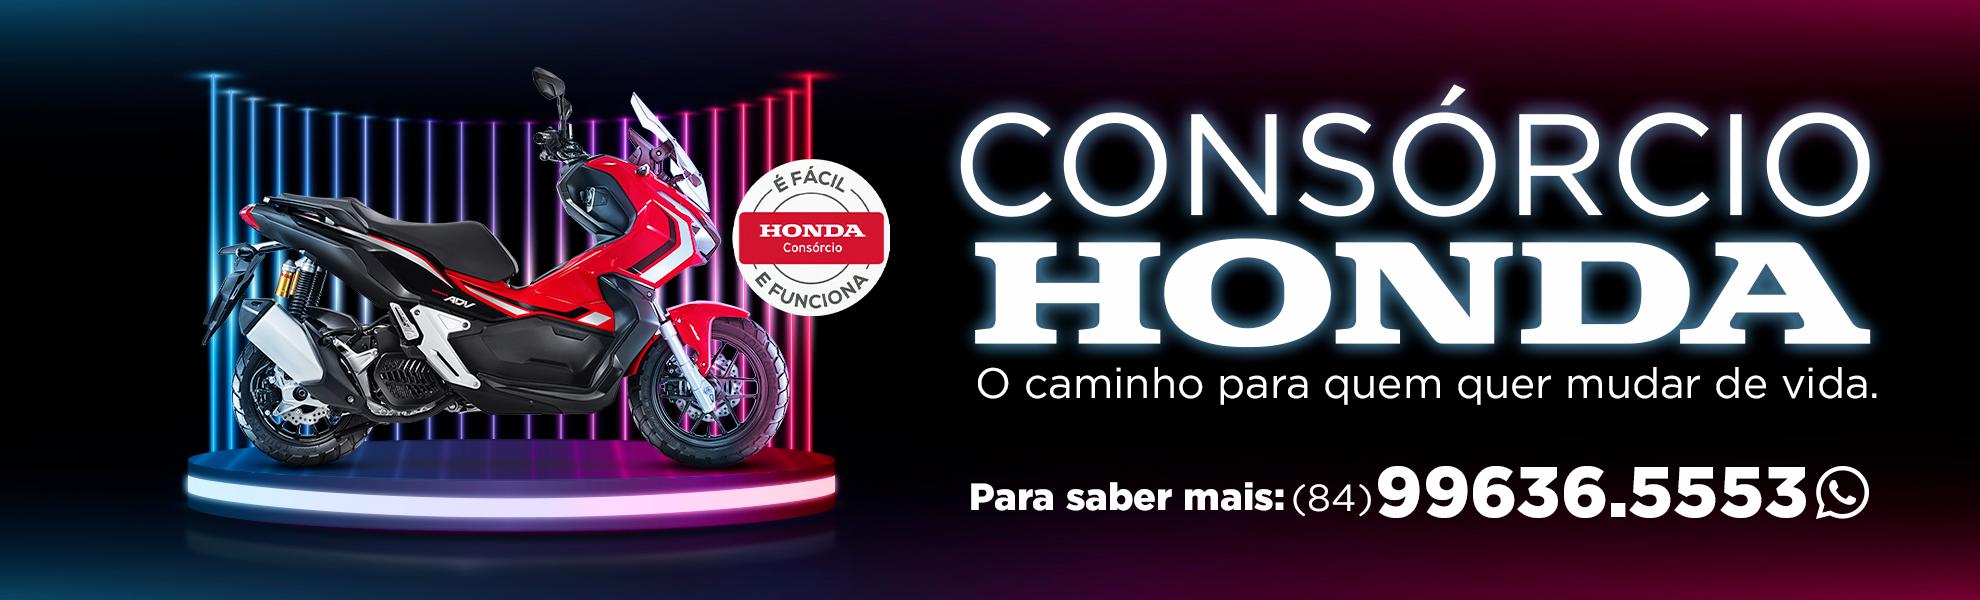 MOTOTEC-BANNER-SITE-02-CONSÓRCIO-HONDA